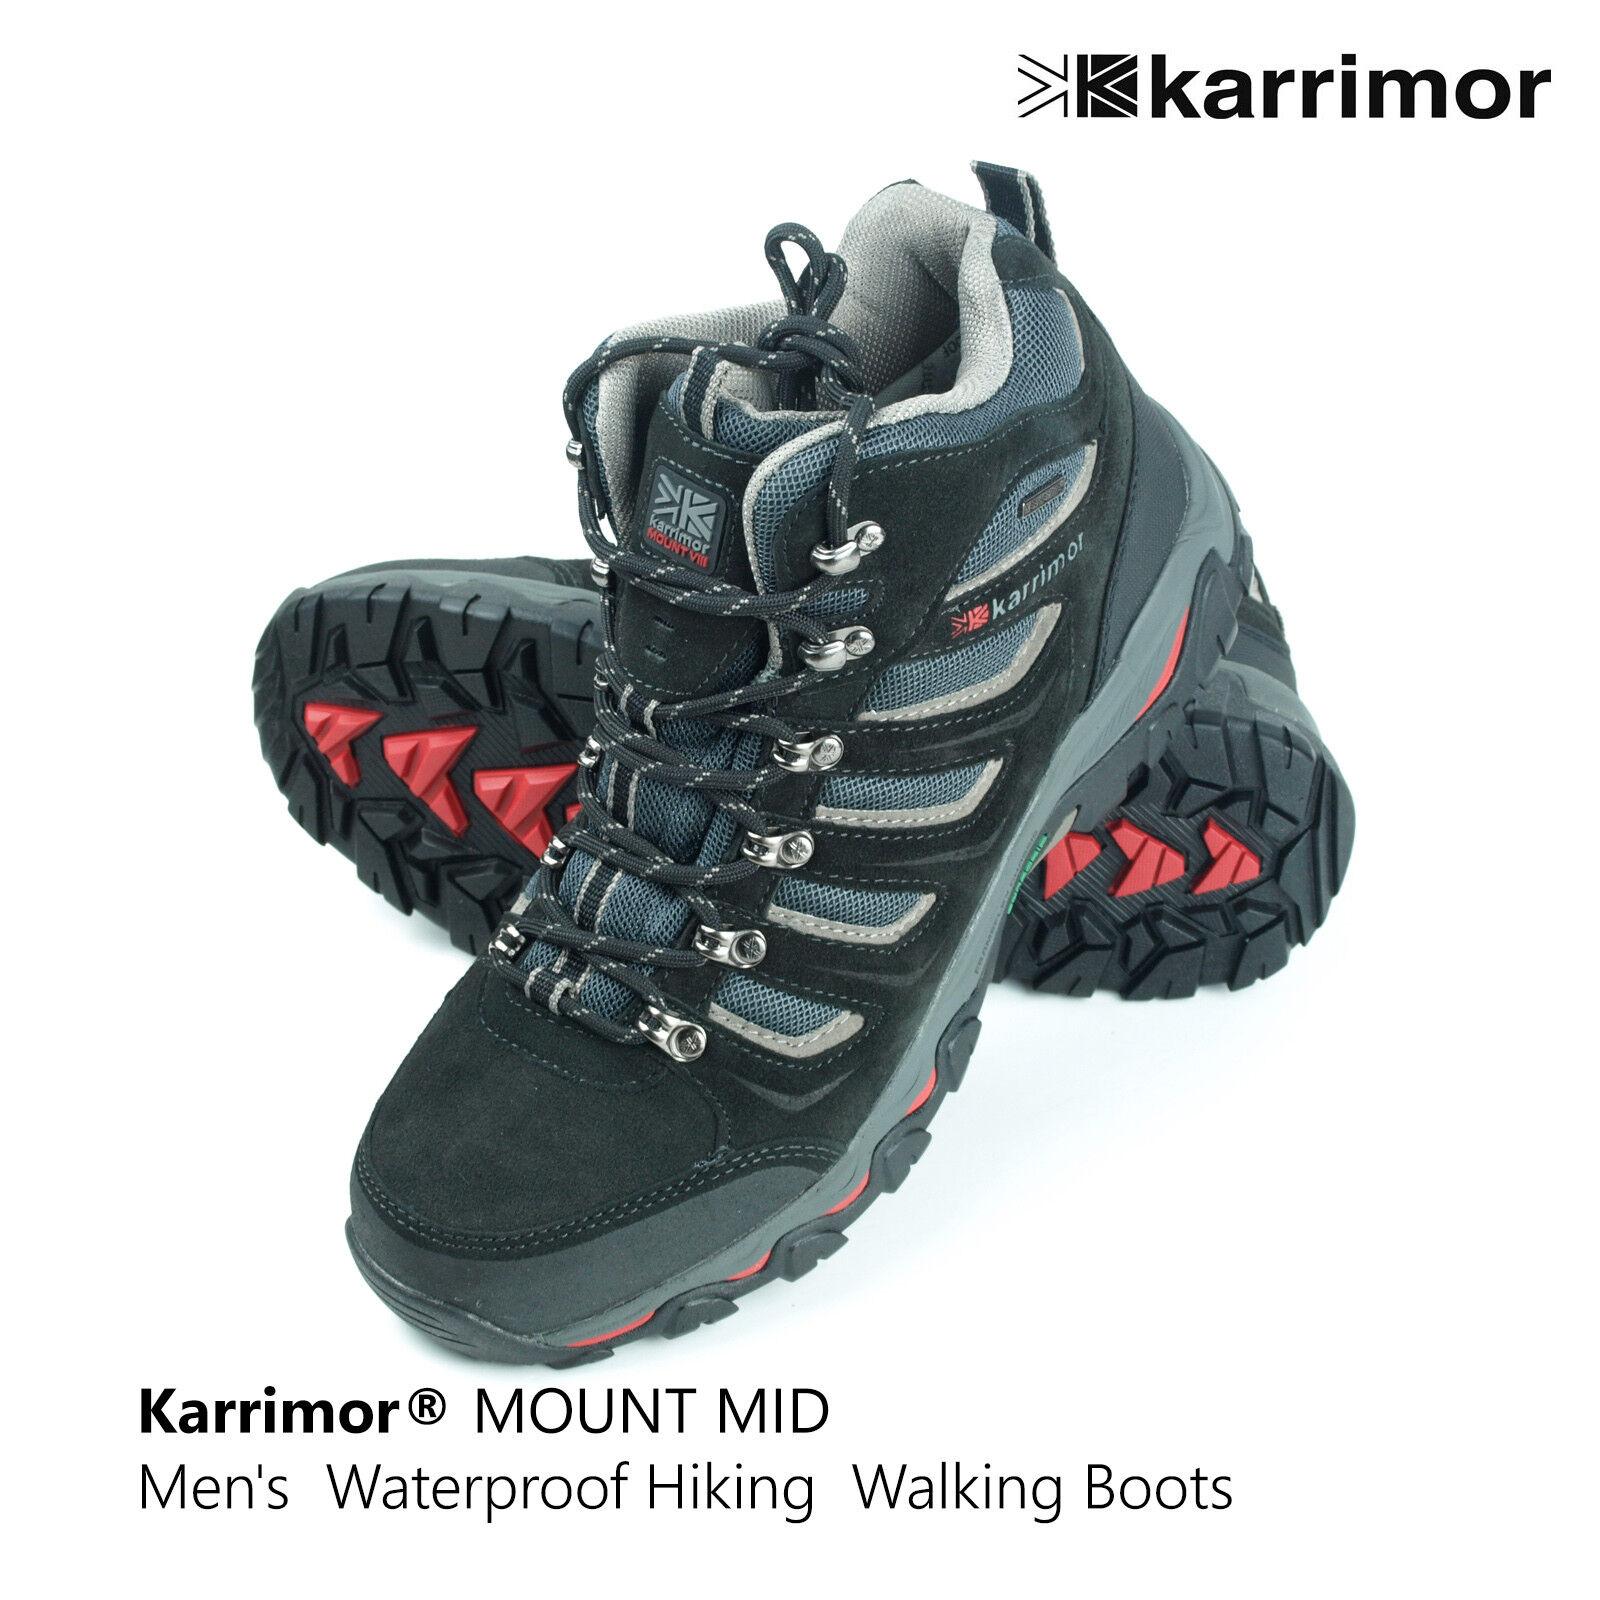 Karrimor Mount Mid Men's Waterproof Hiking Walking Ankle Boots 182105